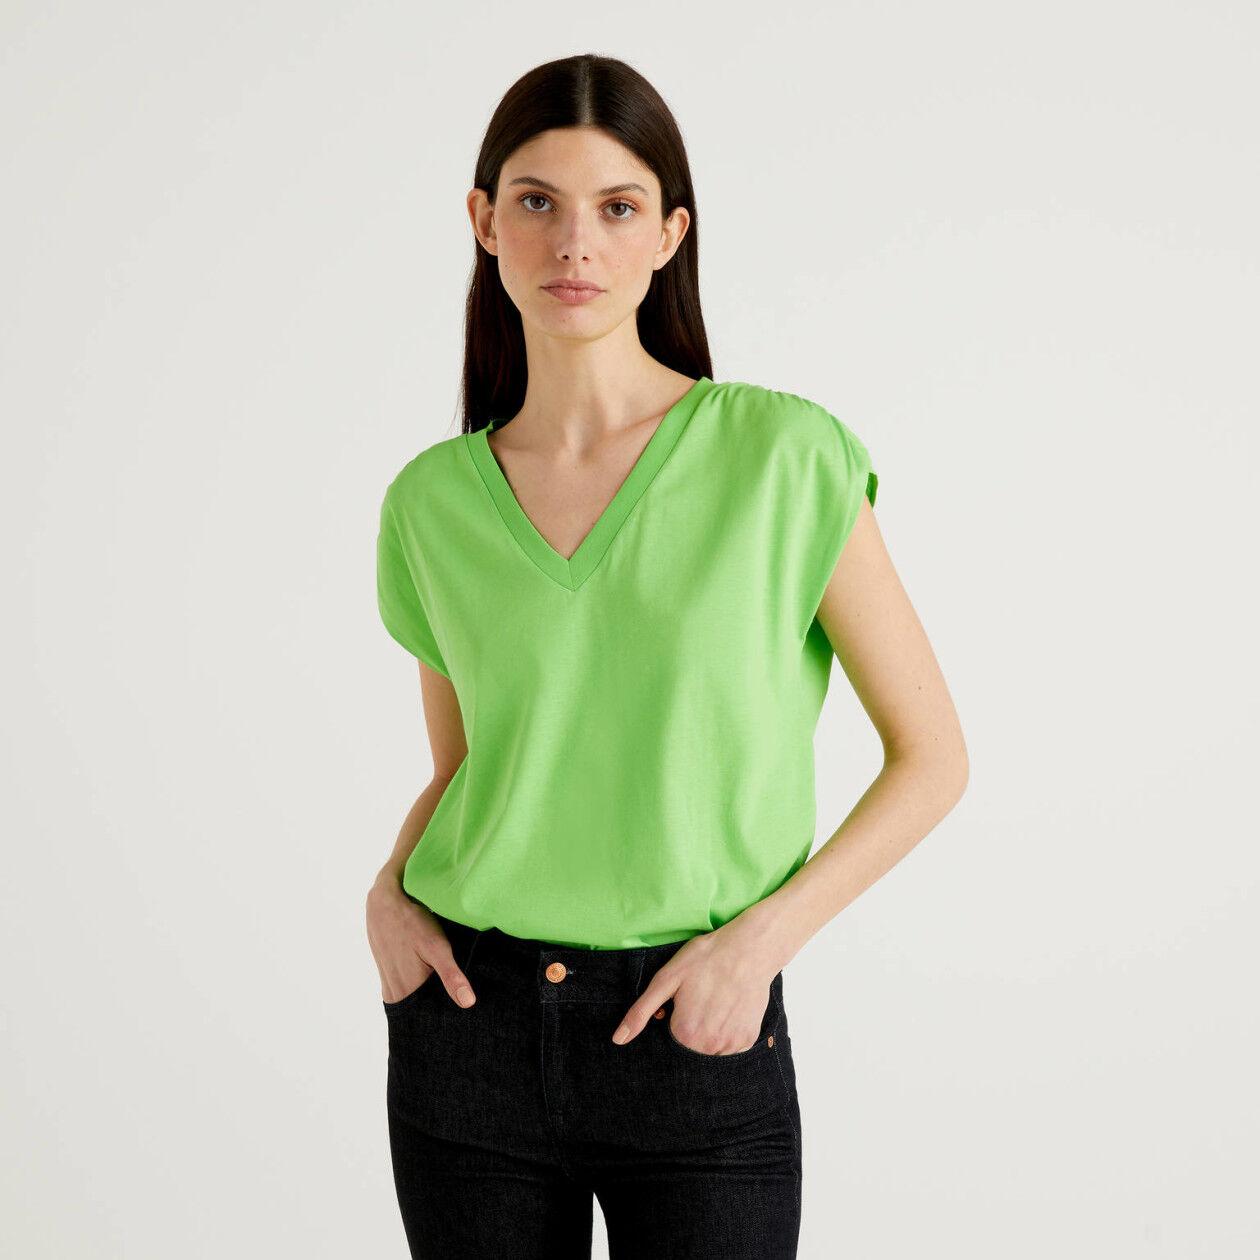 T-shirt κοντομάνικο από 100% βαμβακερό